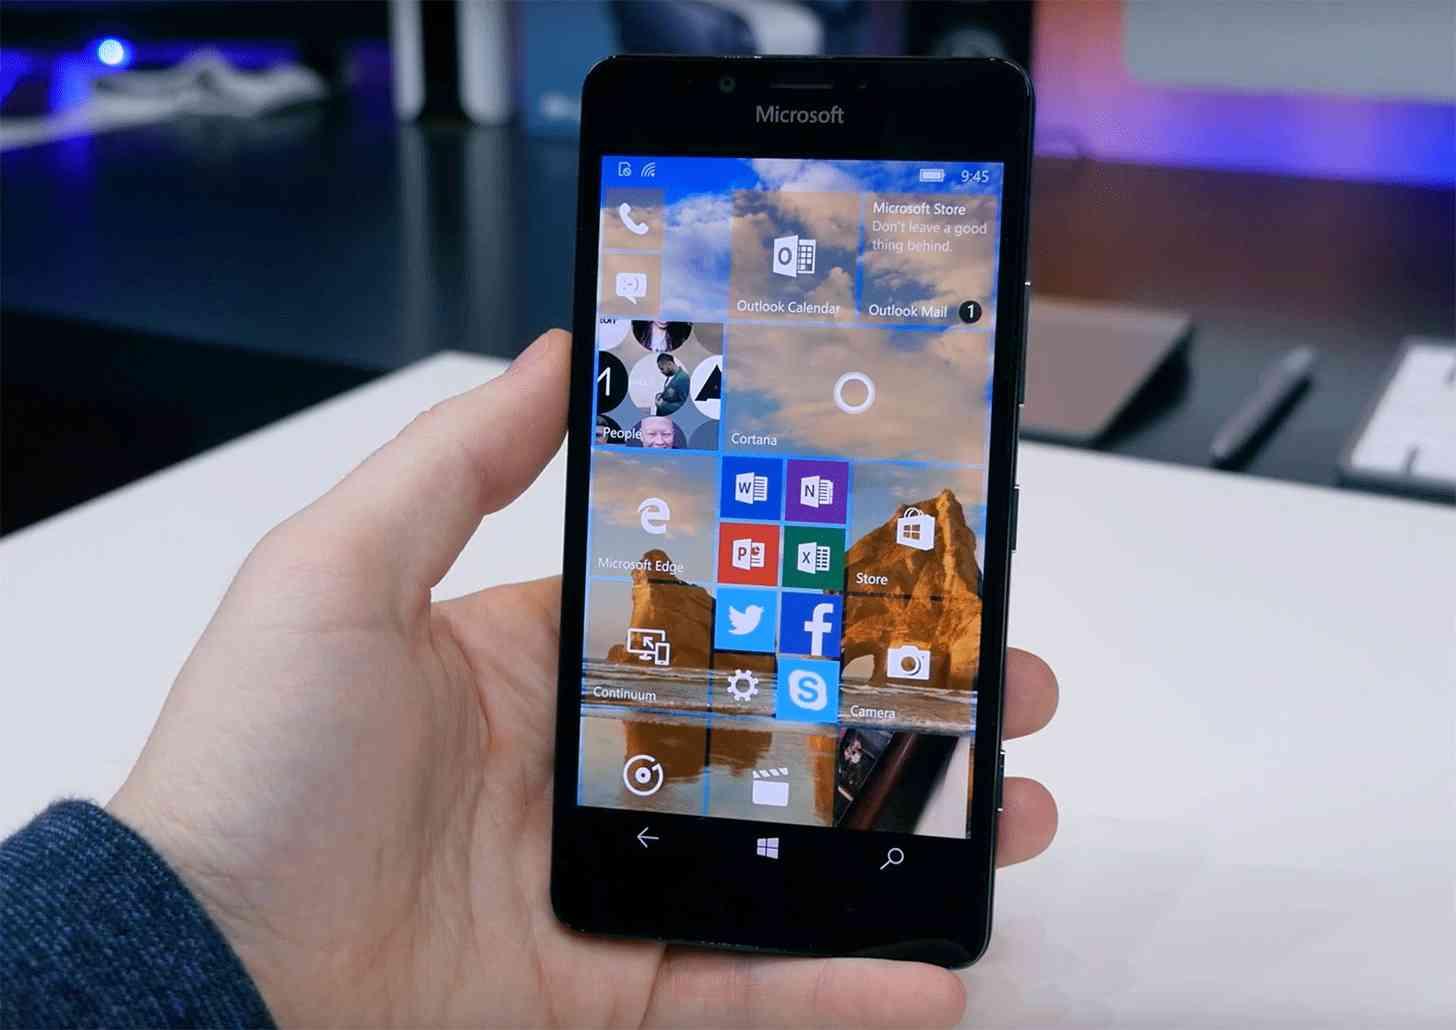 Microsoft Lumia 950 hands on